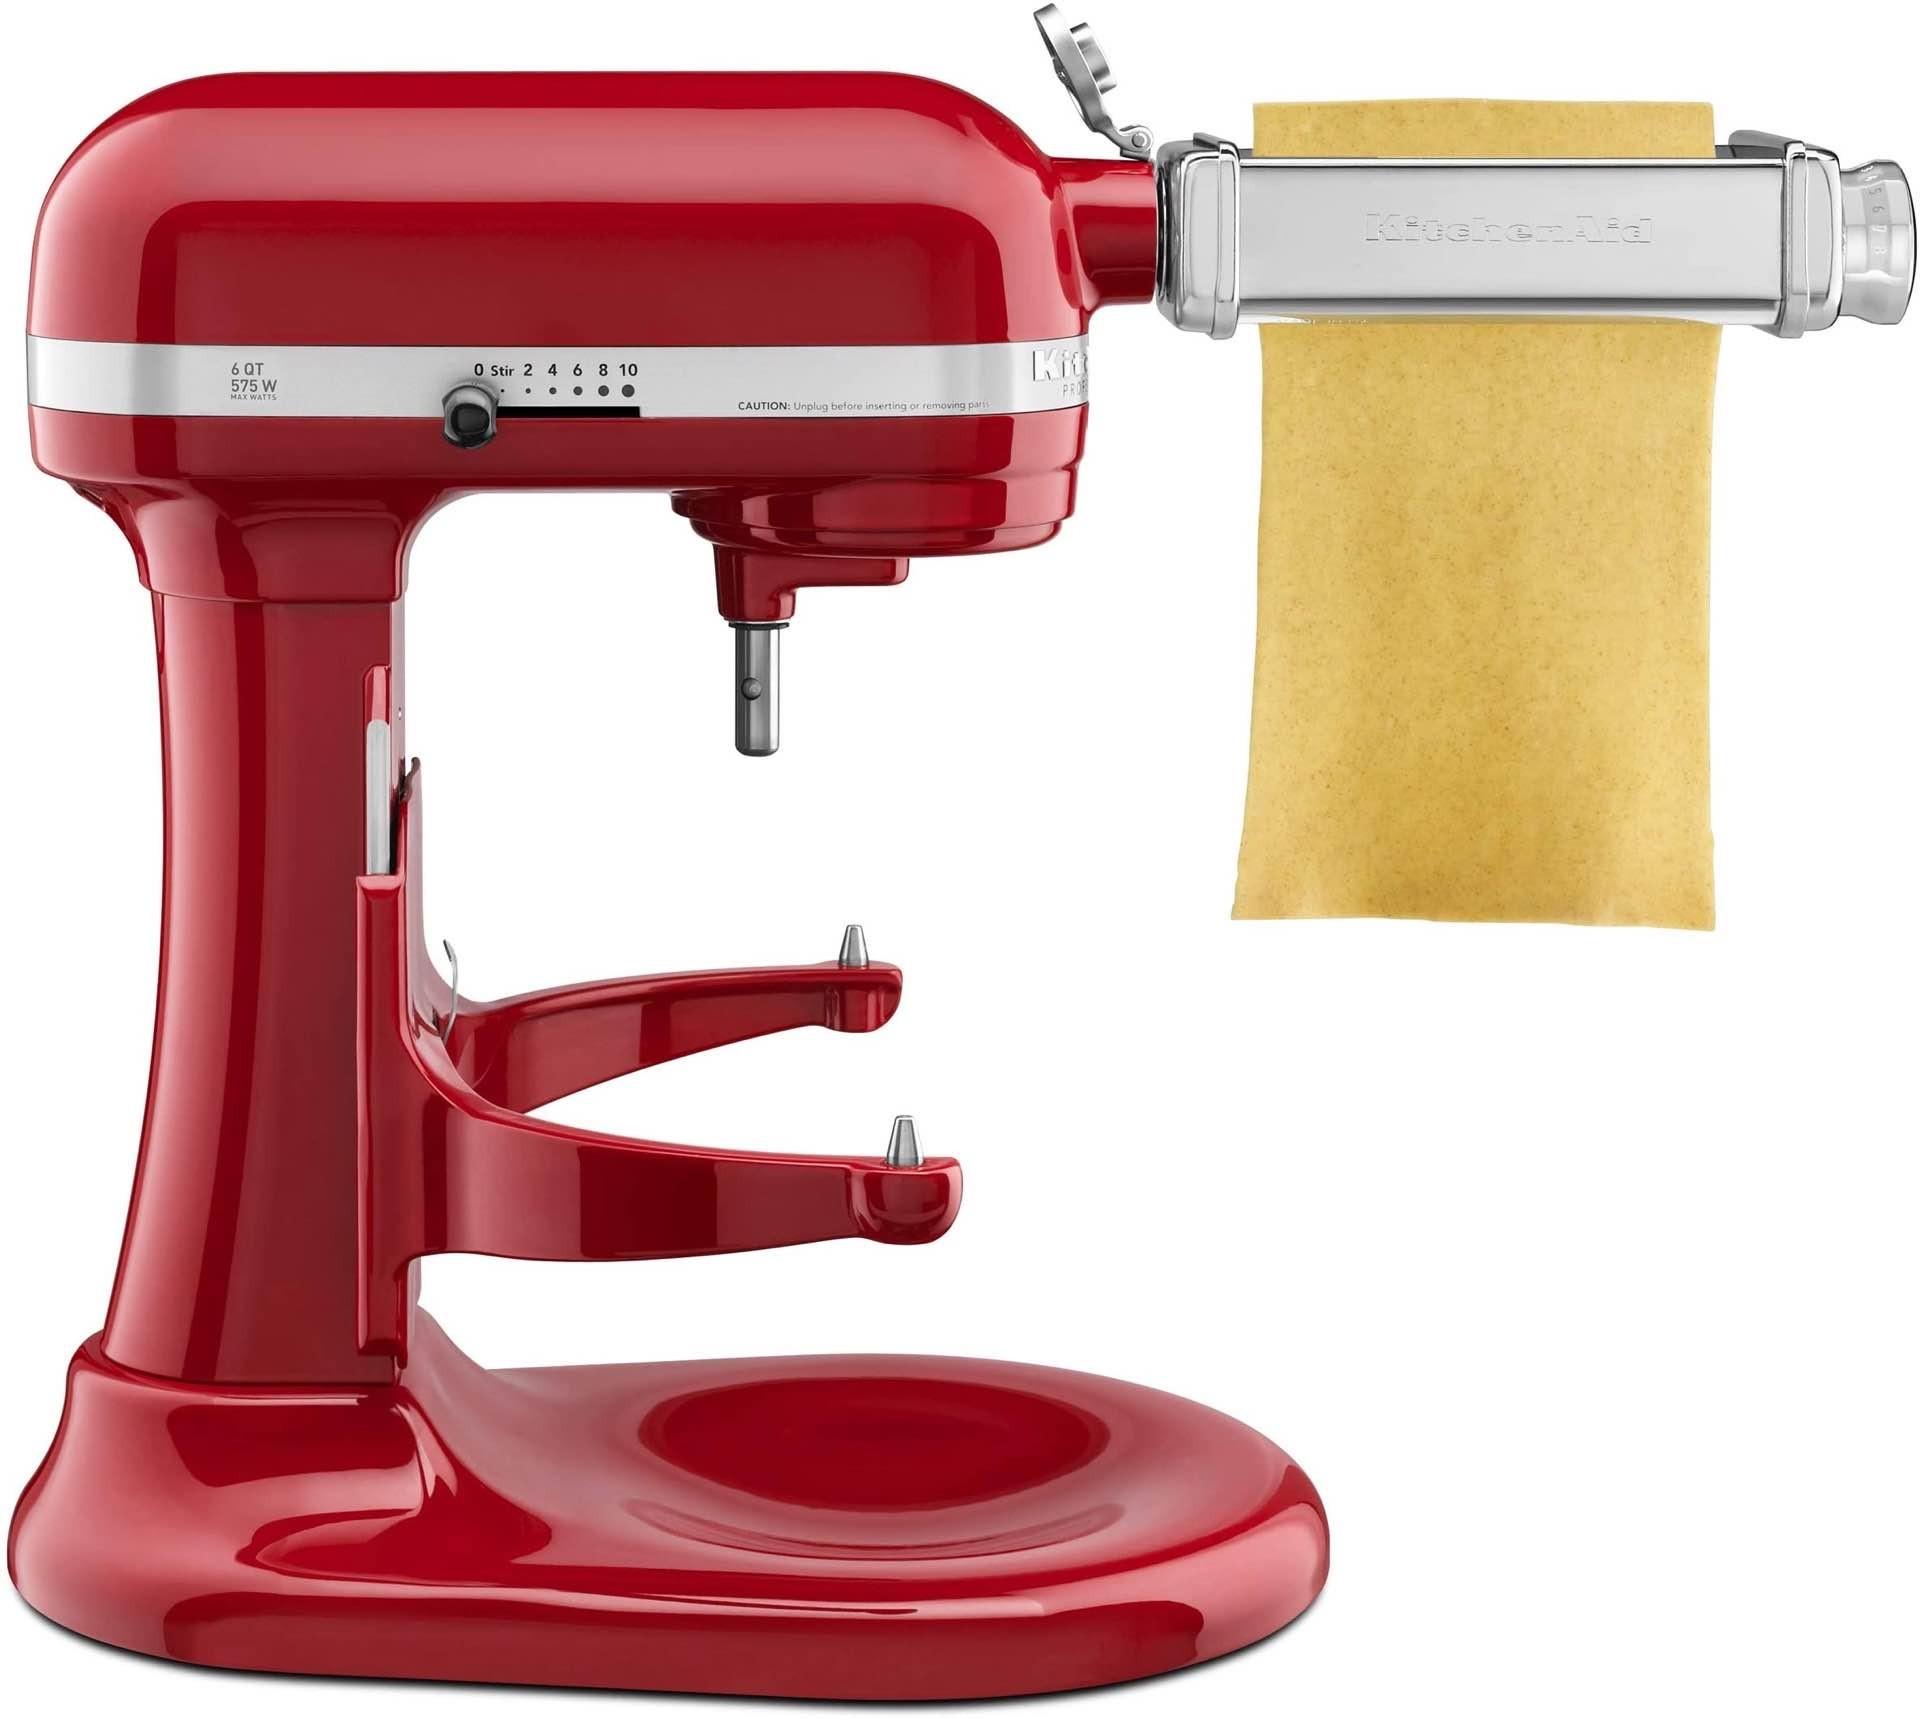 kitchenaid-pro-600-series-stand-mixer-red-pasta-attachment